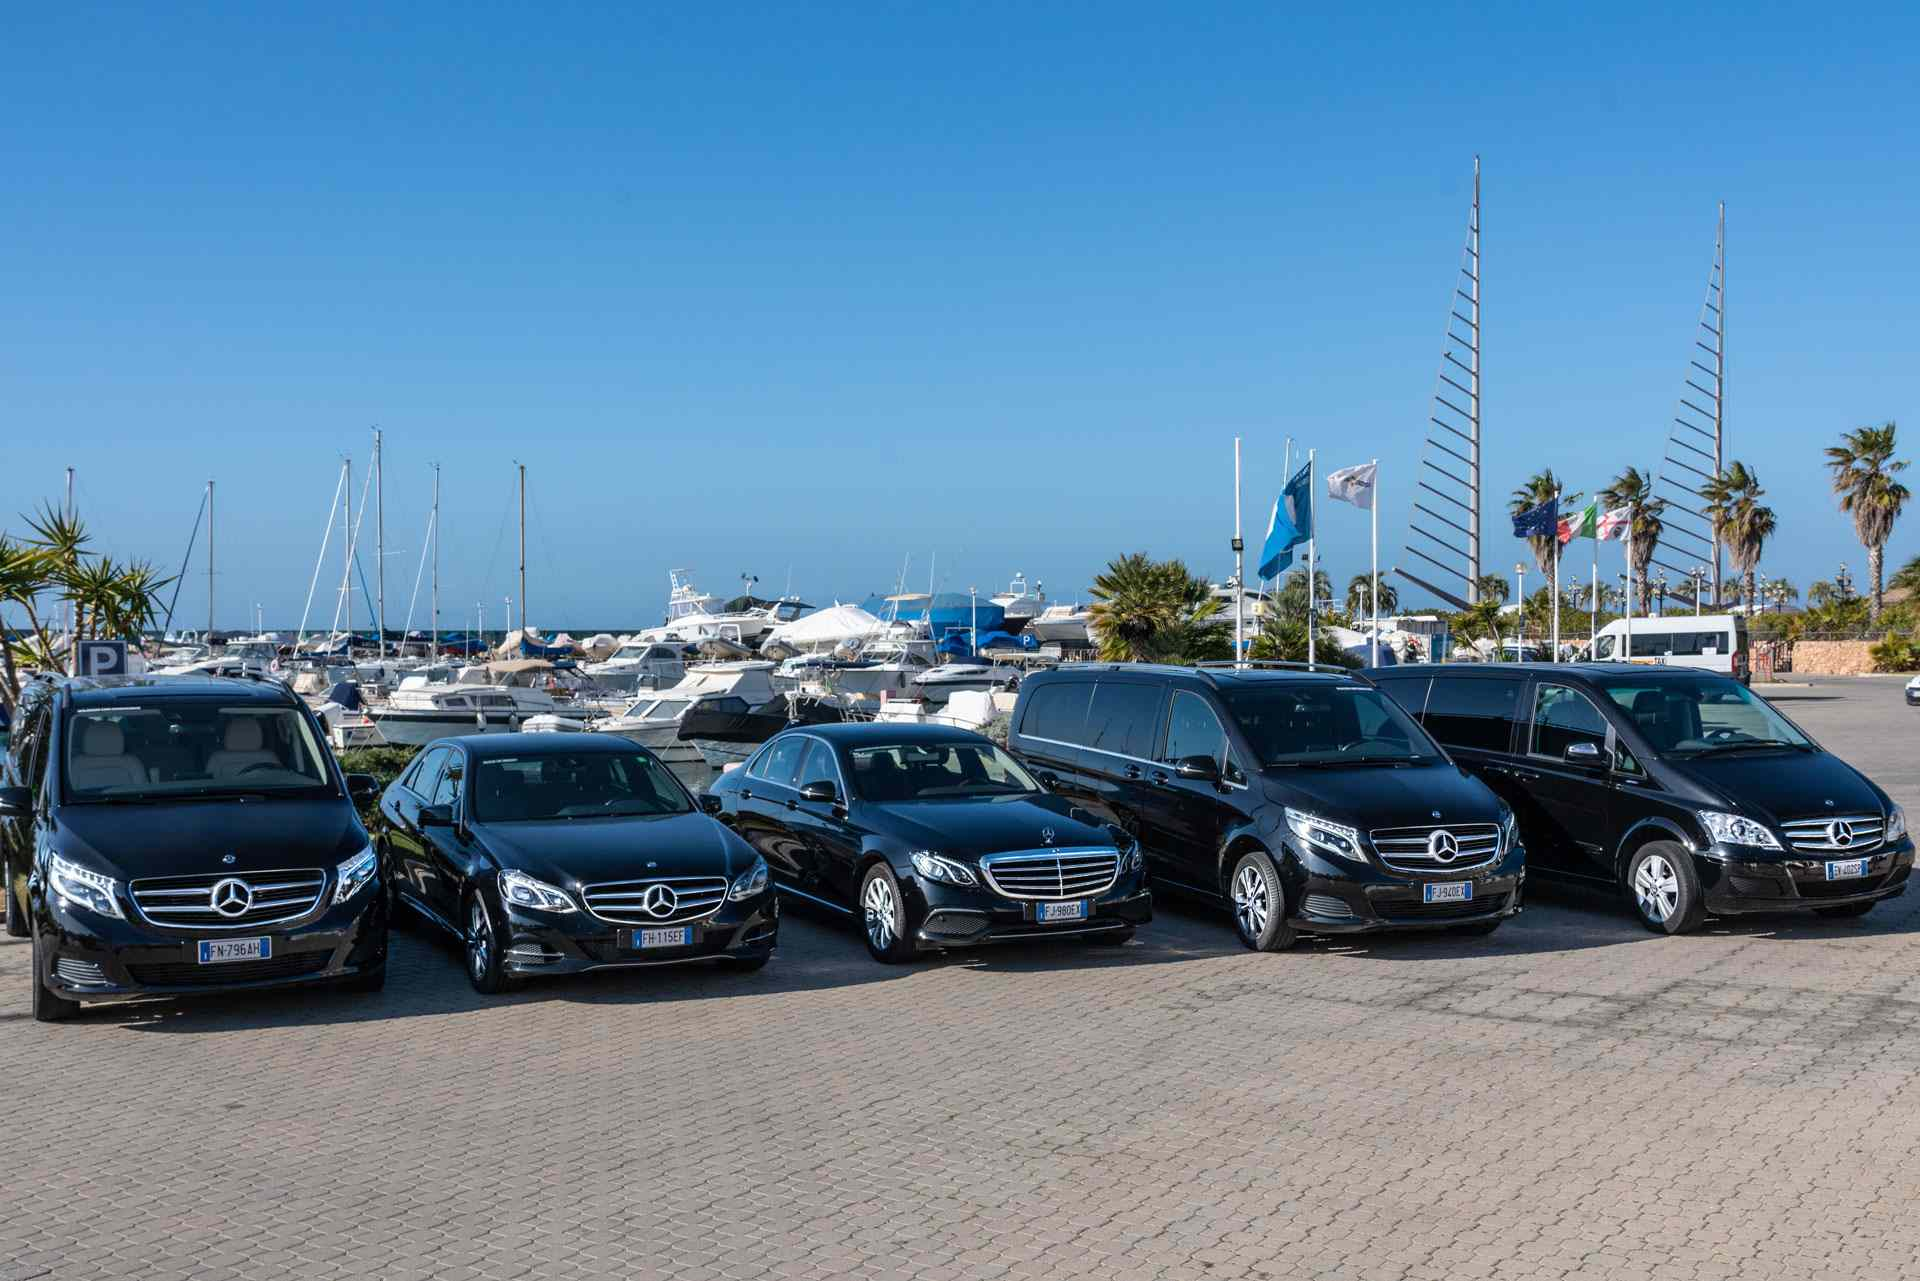 La nostra flotta - Autonoleggio Gianfelice Piras